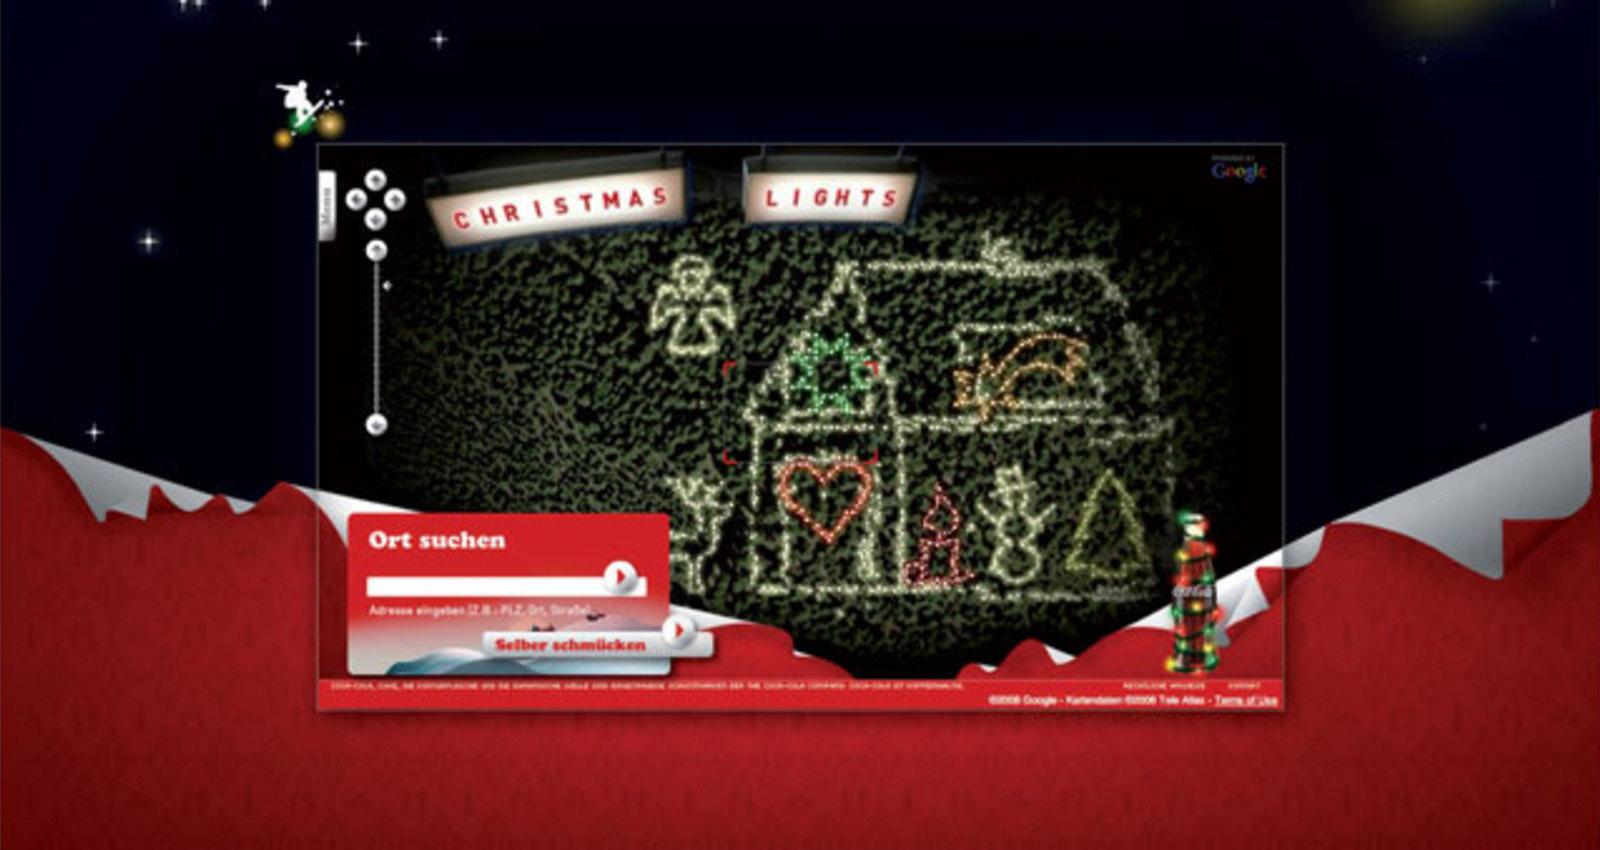 Coca-Cola Xmas 2008 - Christmas Lights